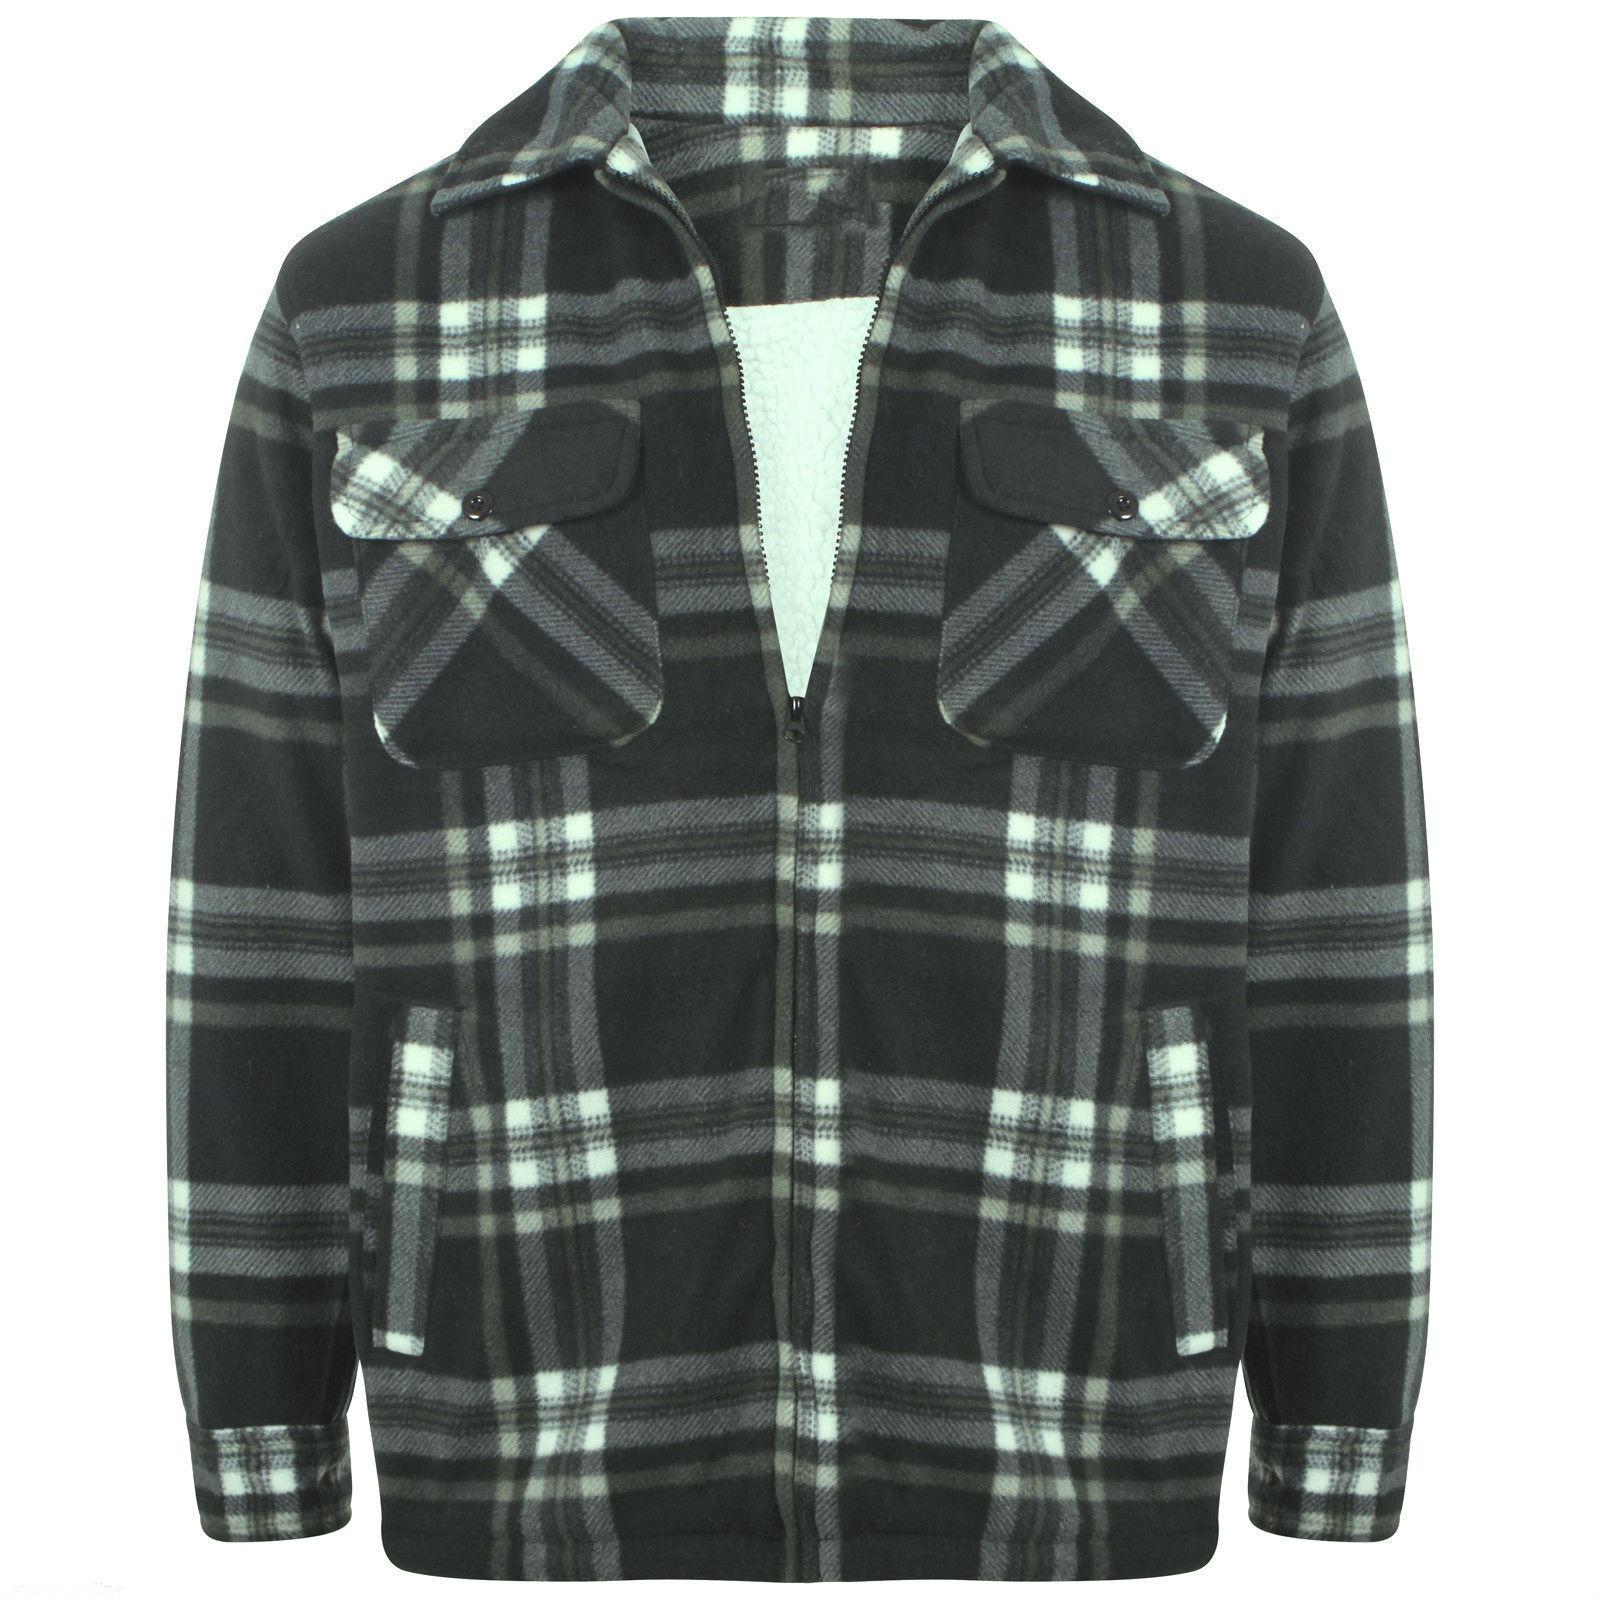 Black / Light Grey Check Thermal Fur Brand New